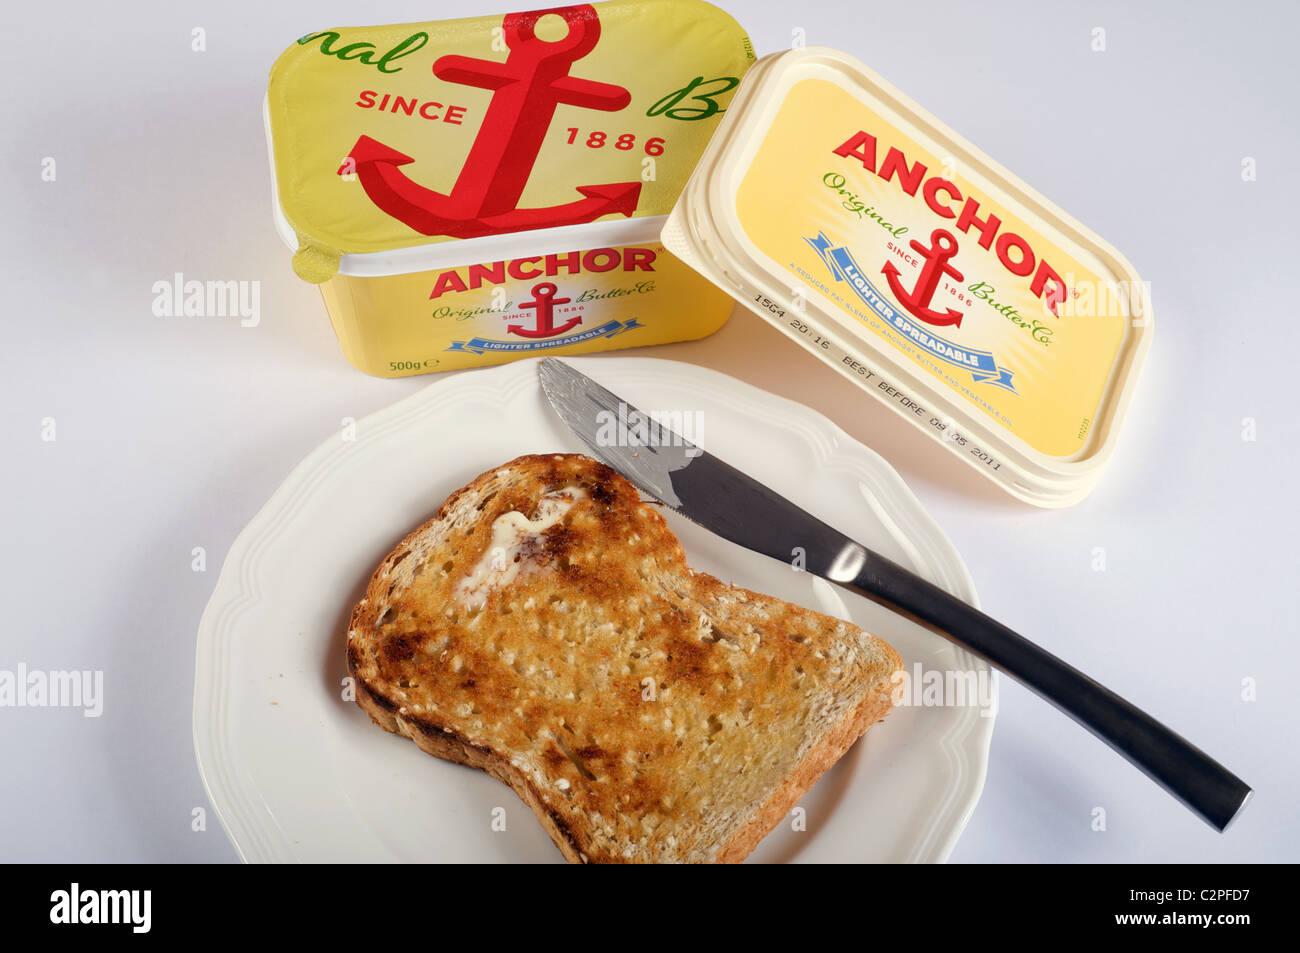 Mantequilla de anclaje y tostadas Imagen De Stock